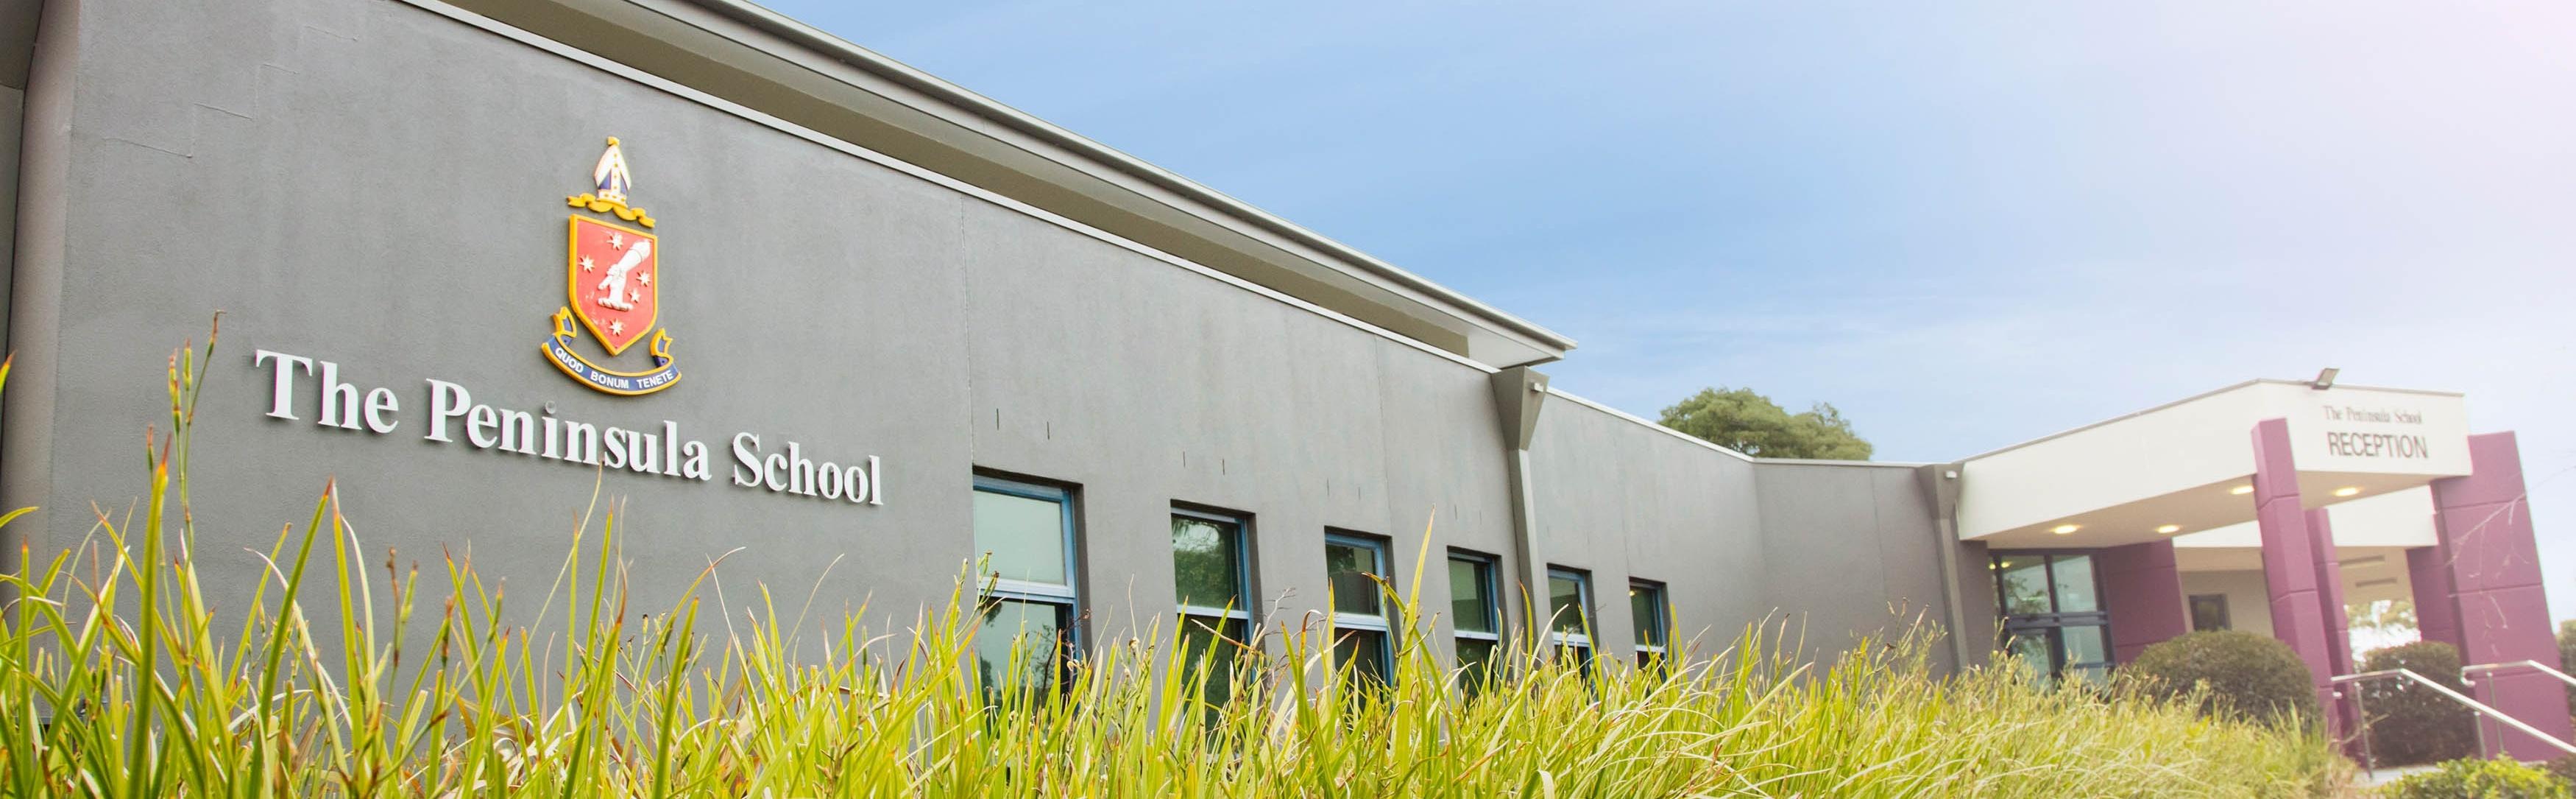 The Peninsula School-369796-edited.jpg